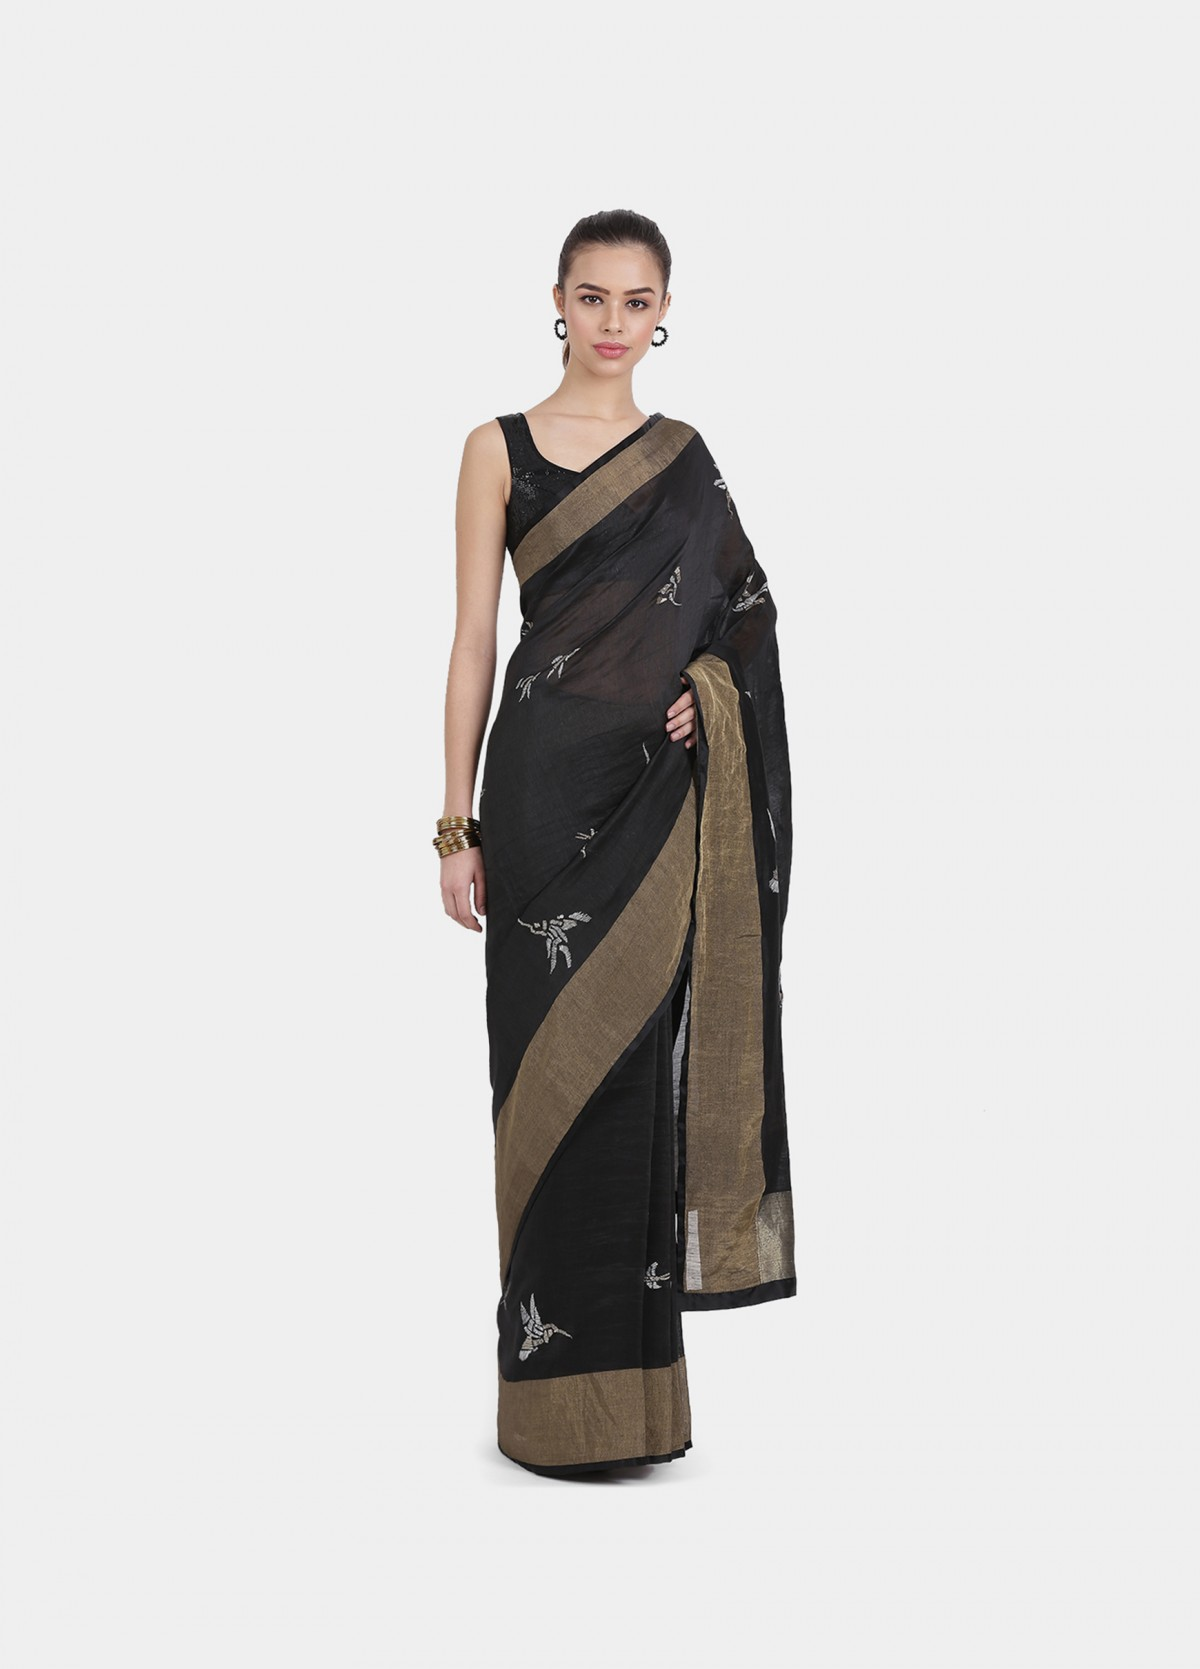 The Humming Sari